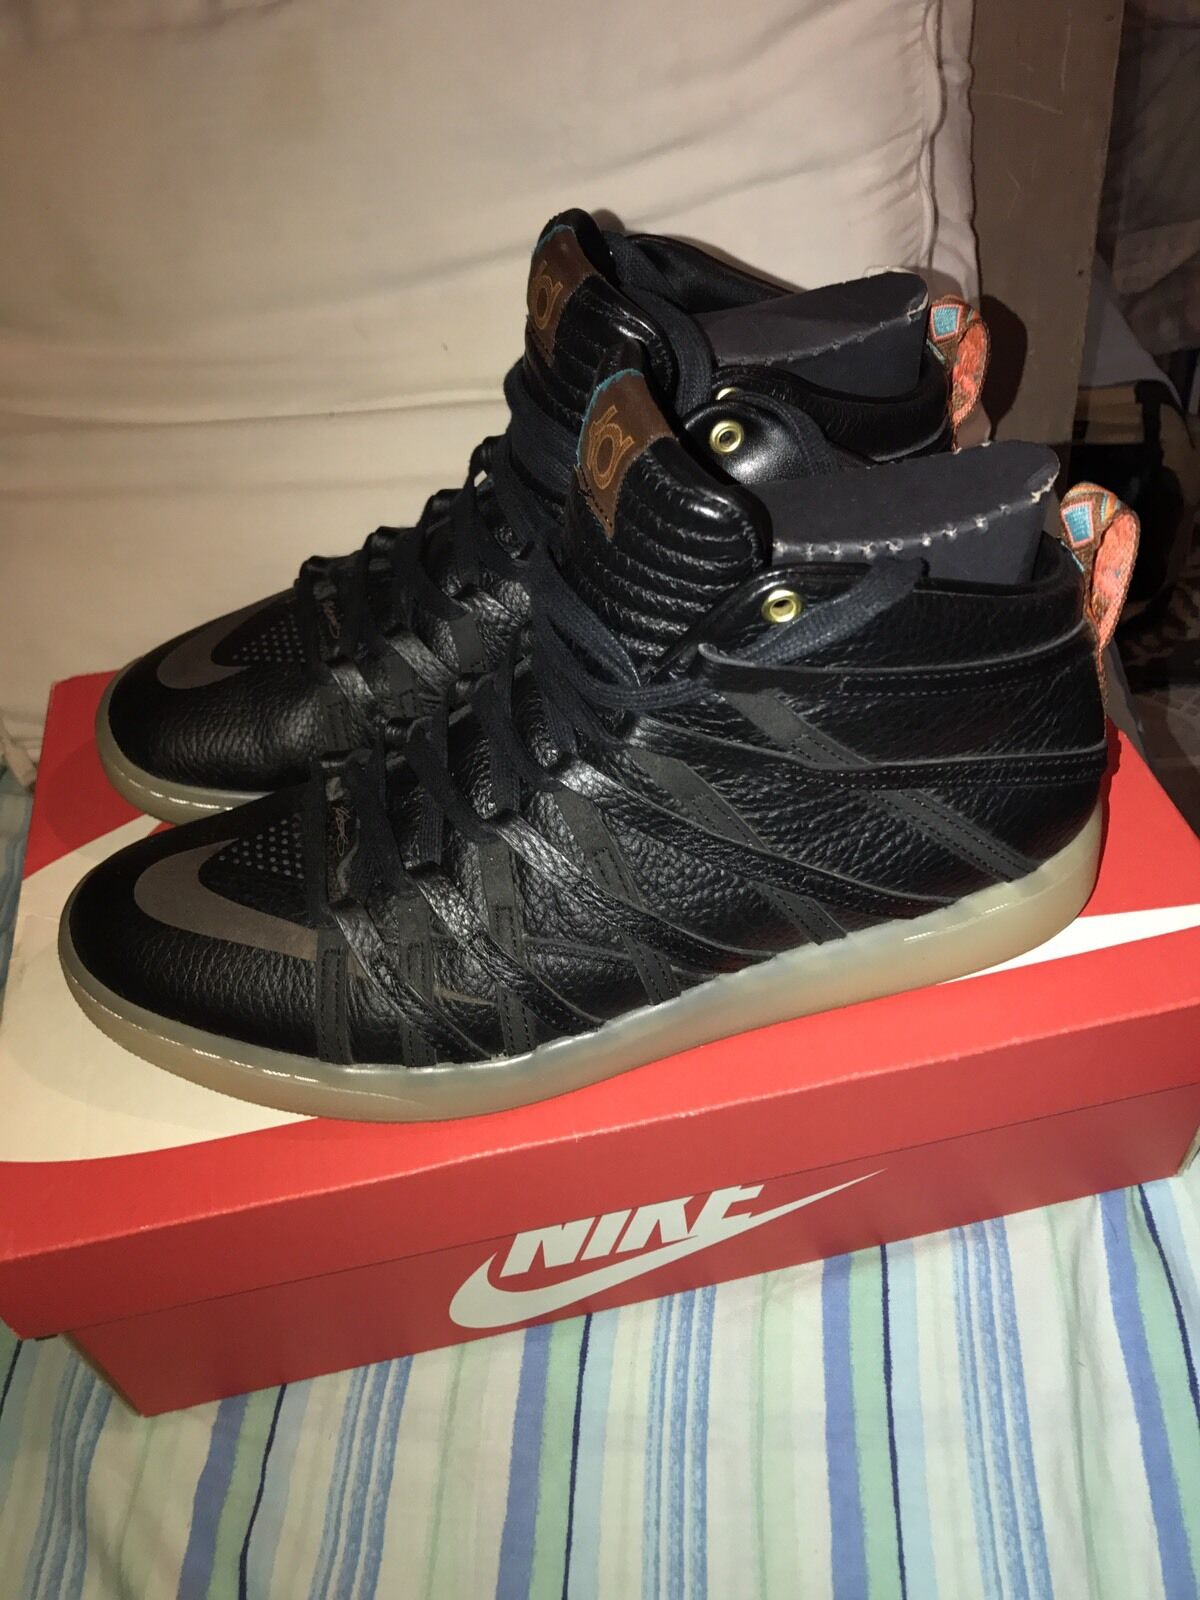 Nike KD VII 7 NSW Lifestyle Black/Black Size 9.5 100% AUTHENTIC RARE VNDS